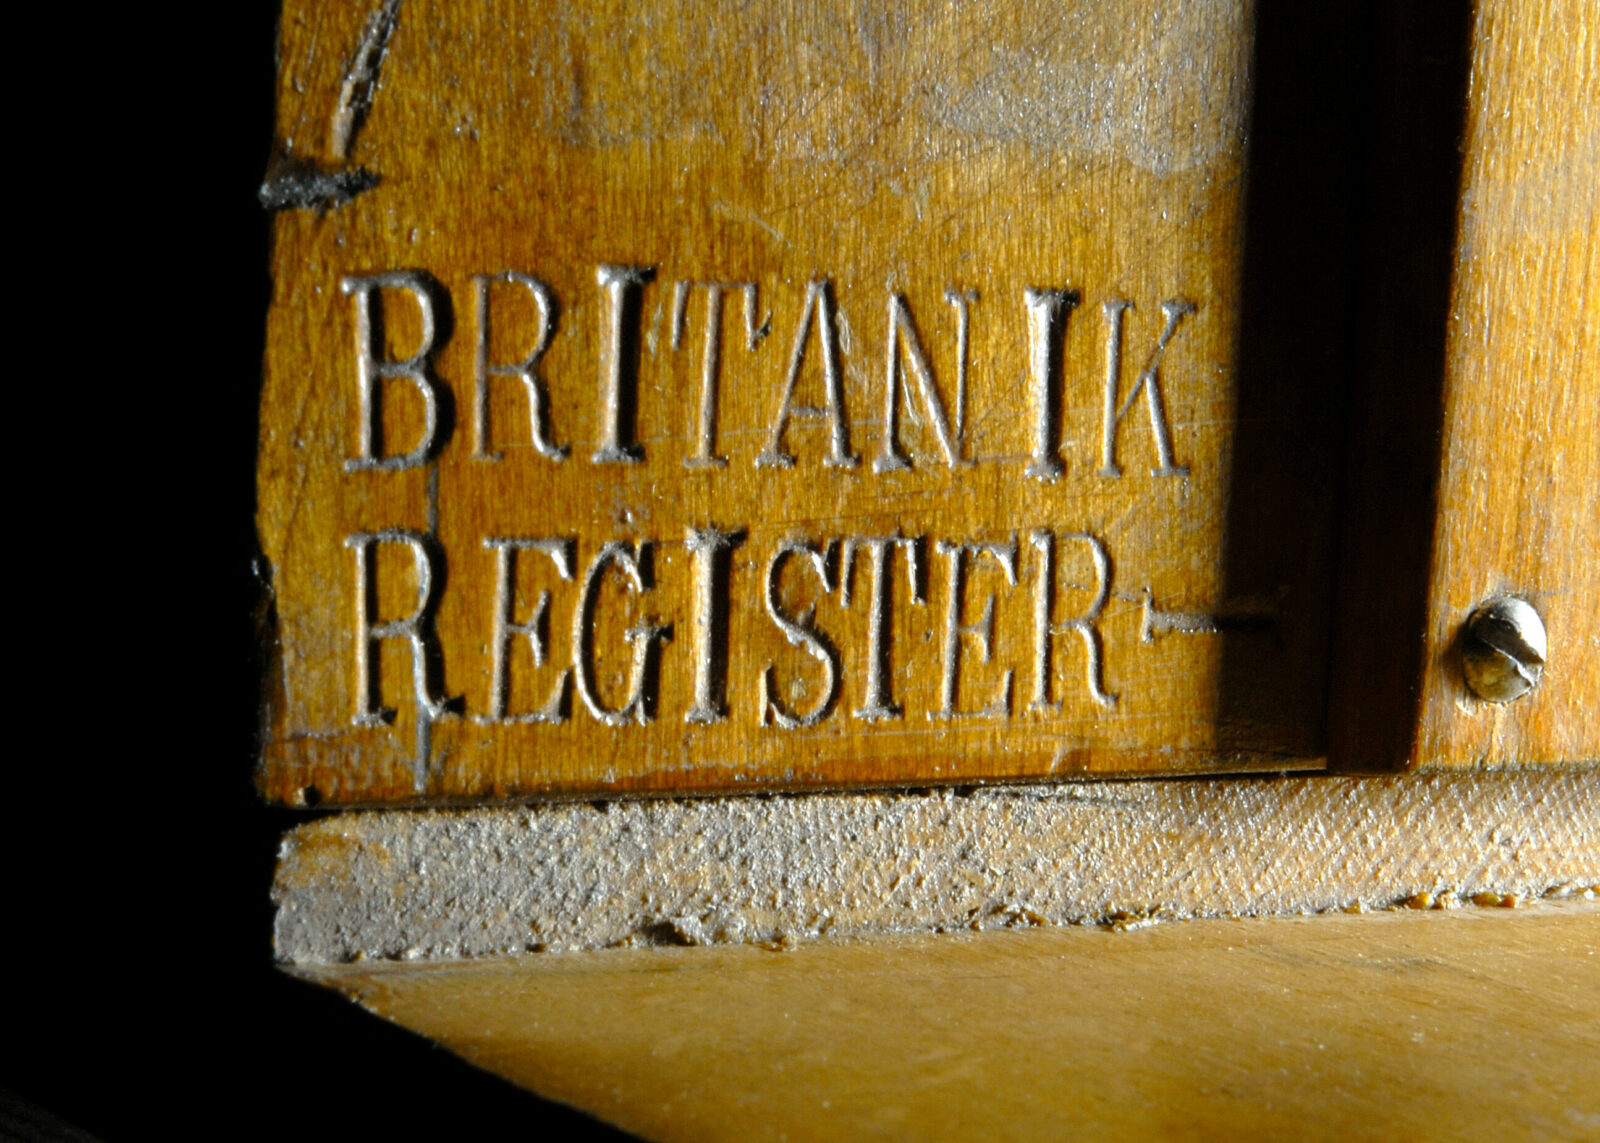 08 MMA 07 Britannic Orgel Hinweis